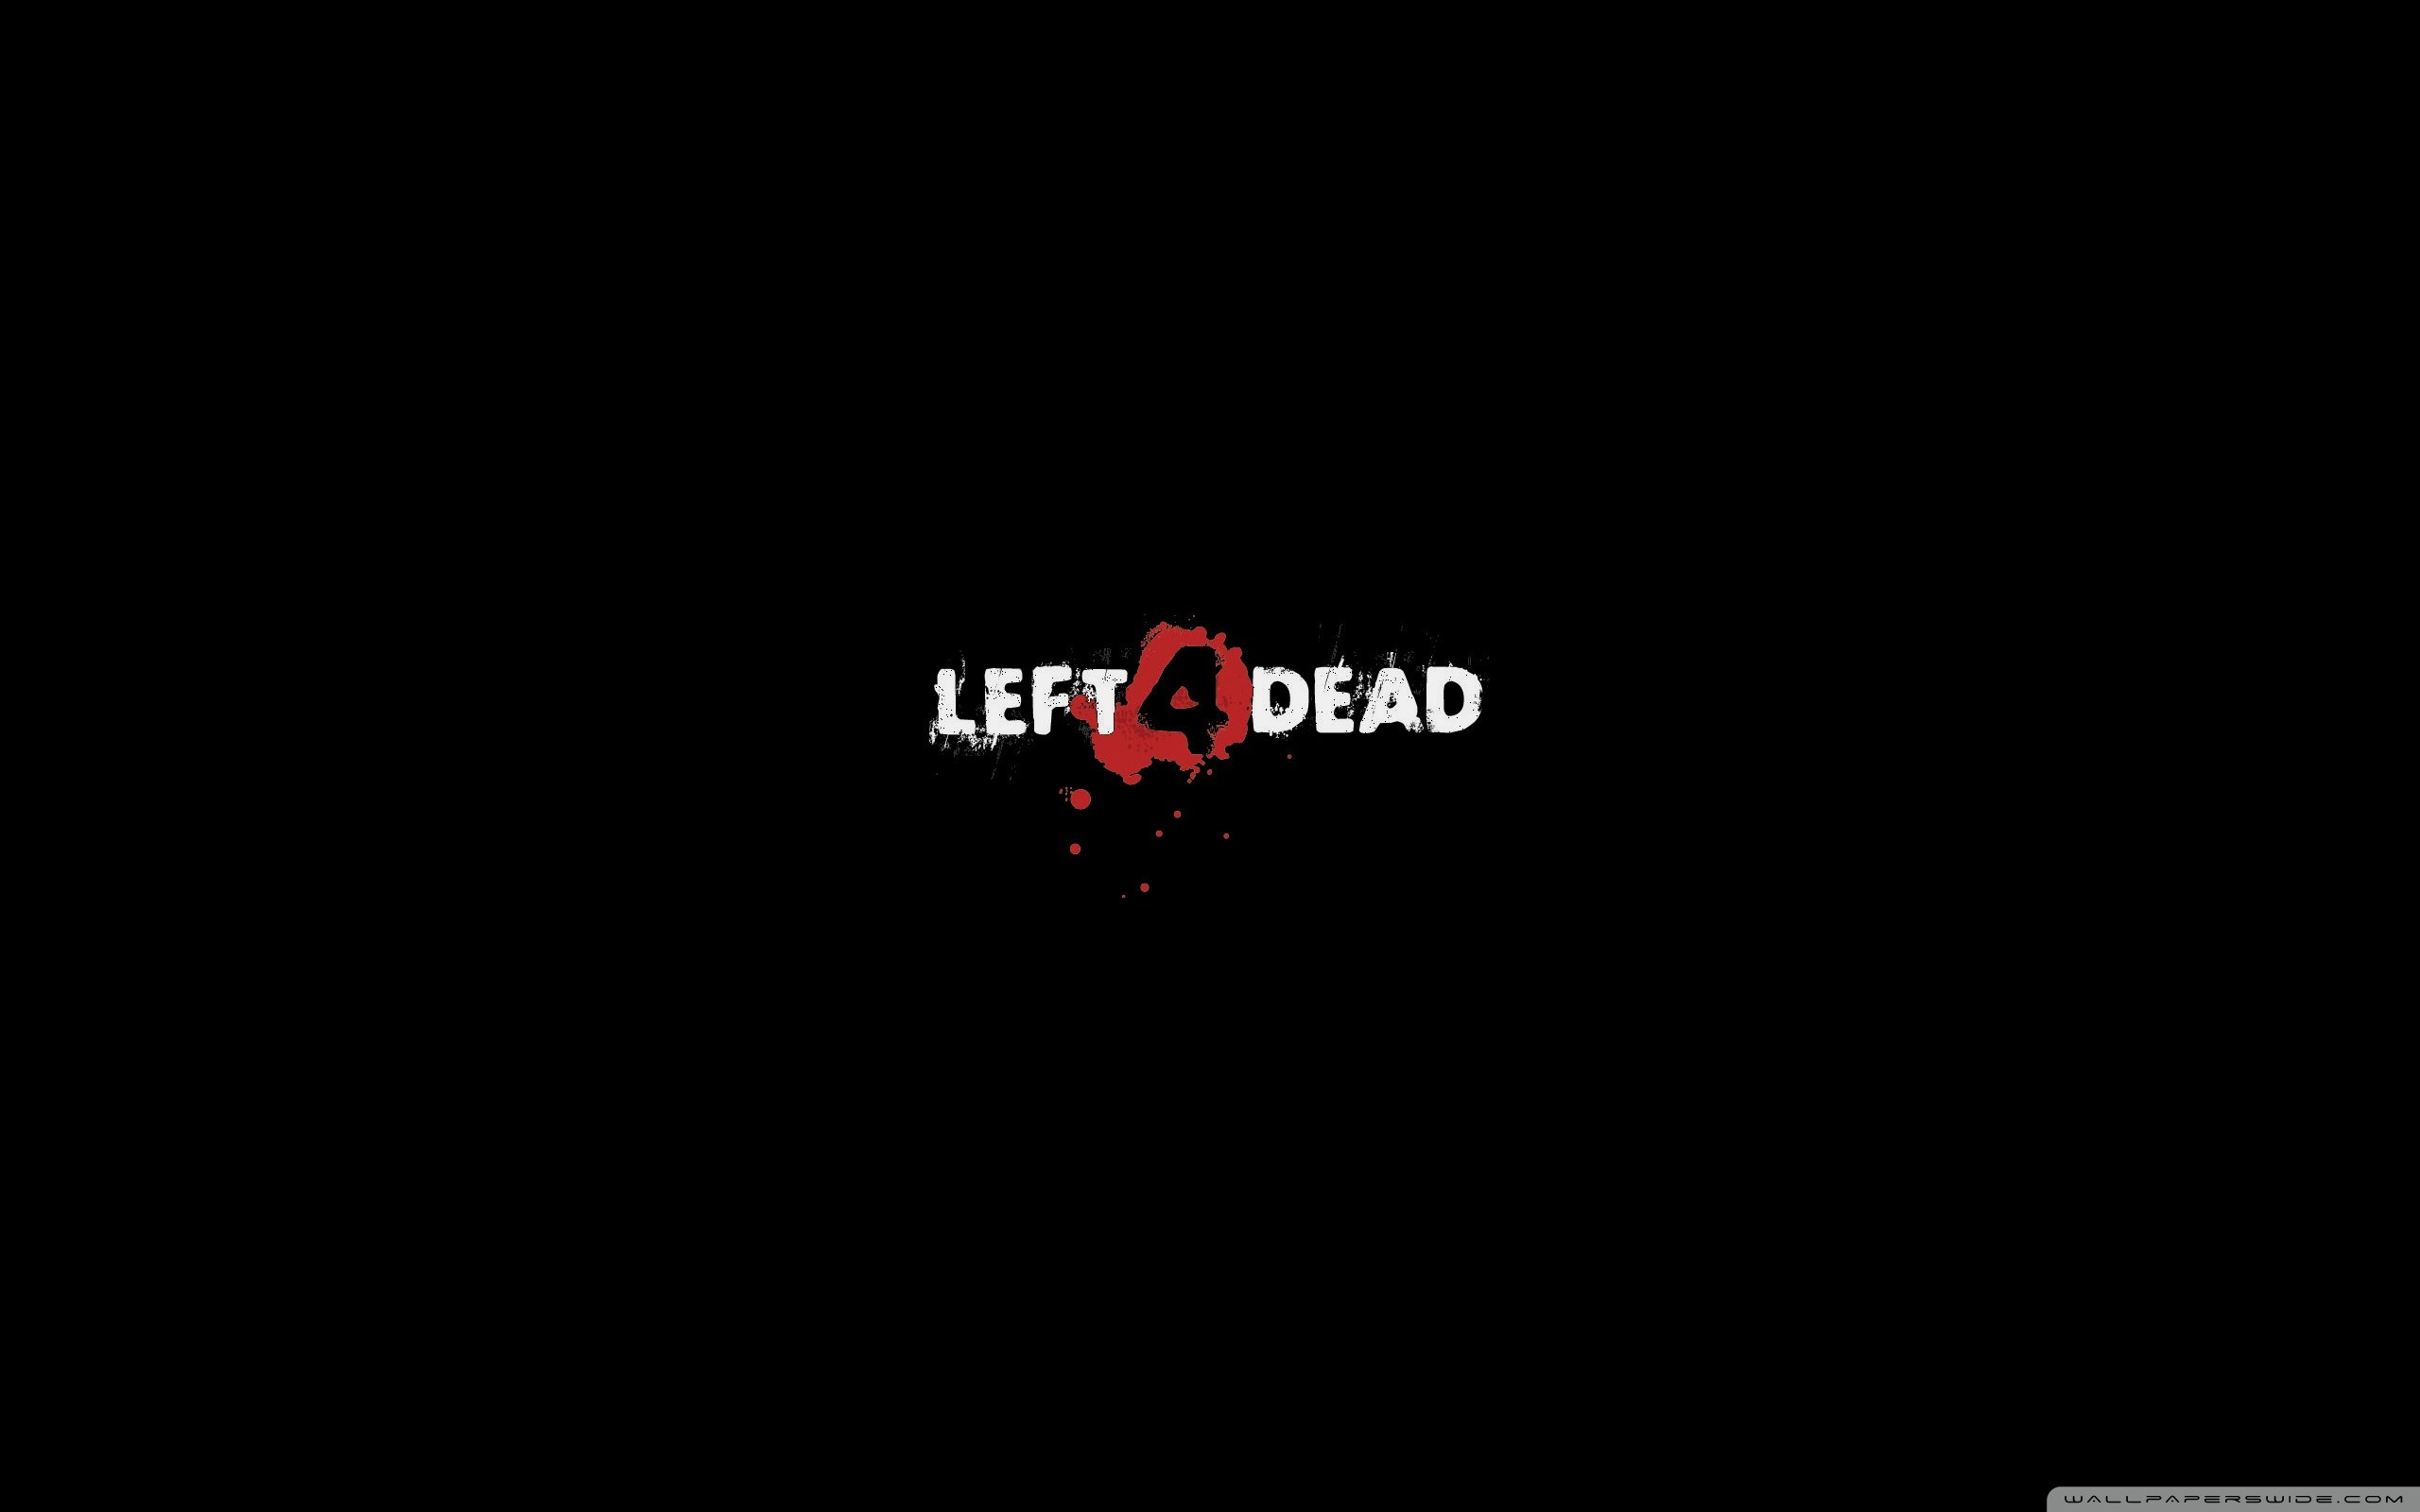 Res: 2560x1600, Left 4 Dead Logo Black HD Wide Wallpaper for 4K UHD Widescreen desktop &  smartphone